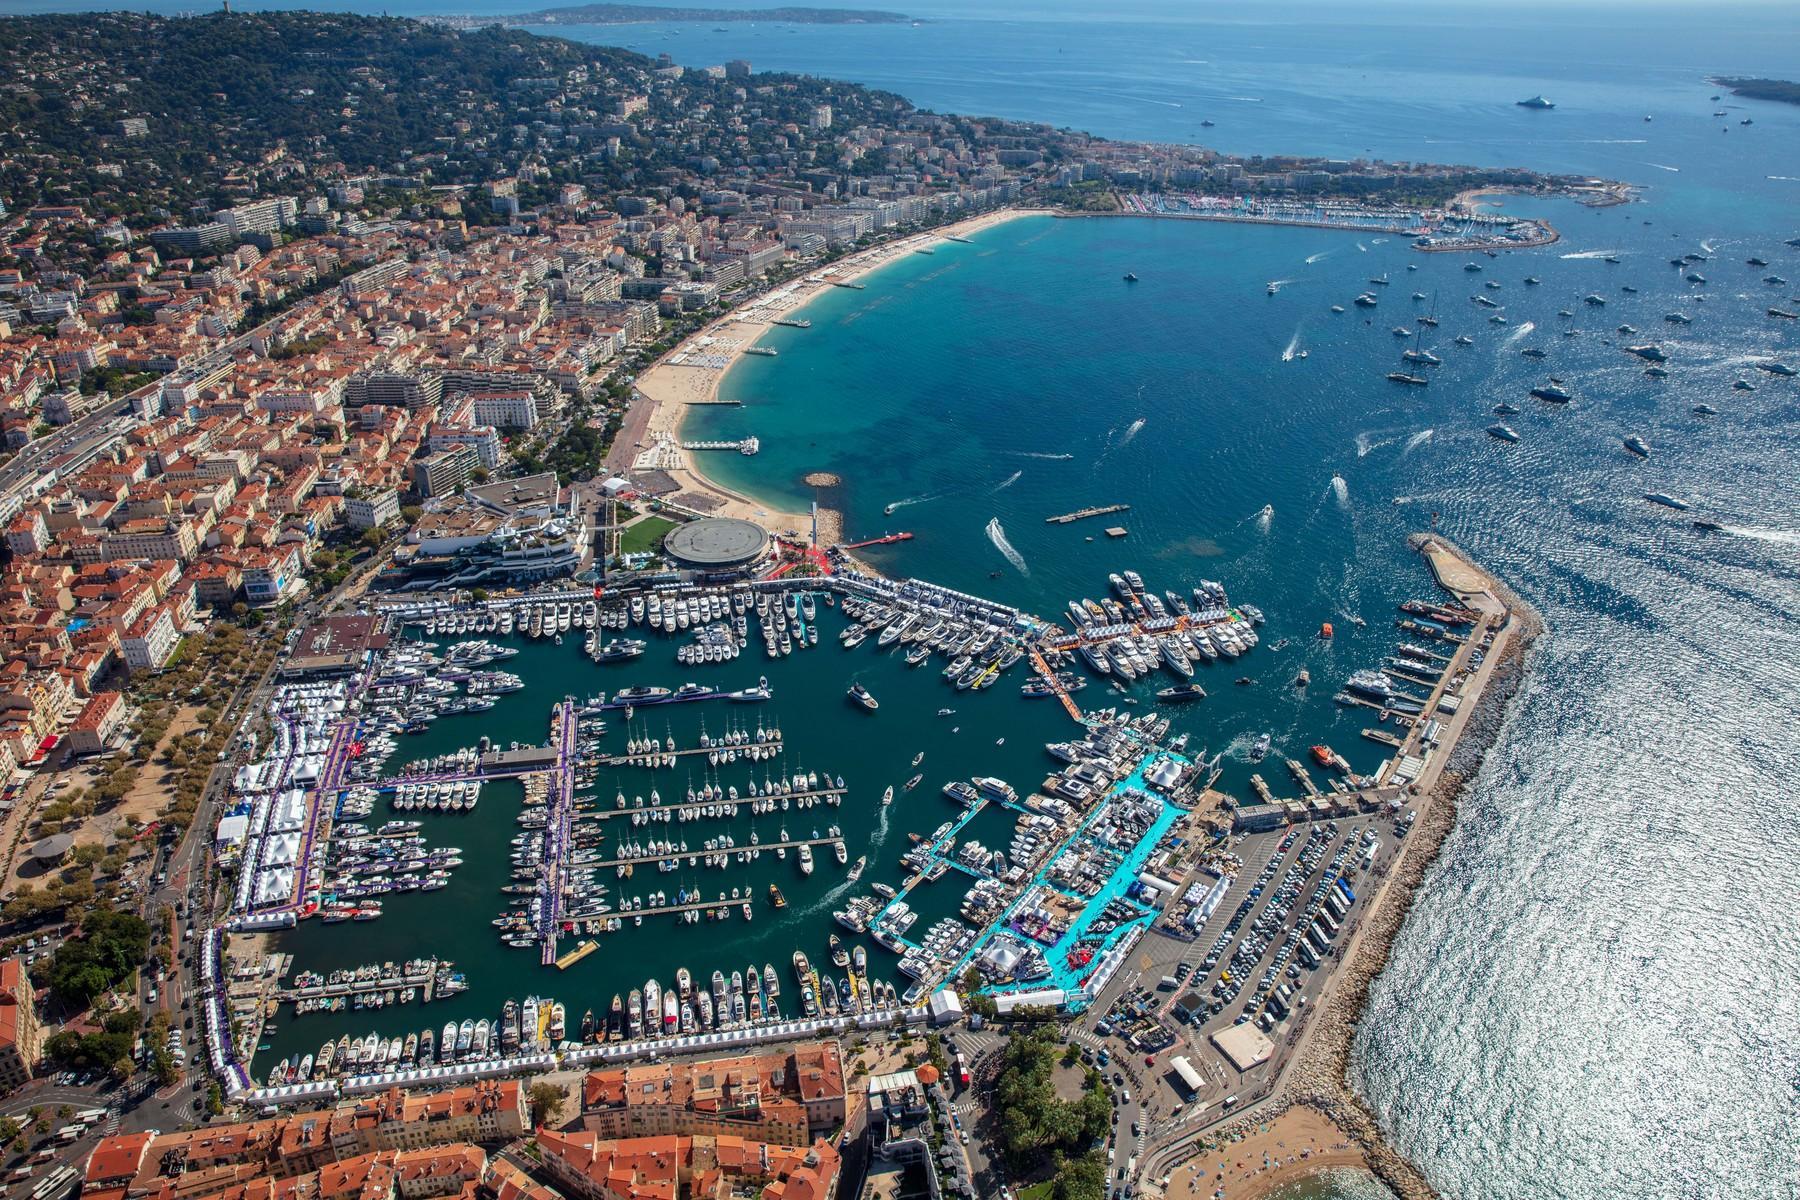 eBlue_economy_Cannes Yachting Feestival 2021